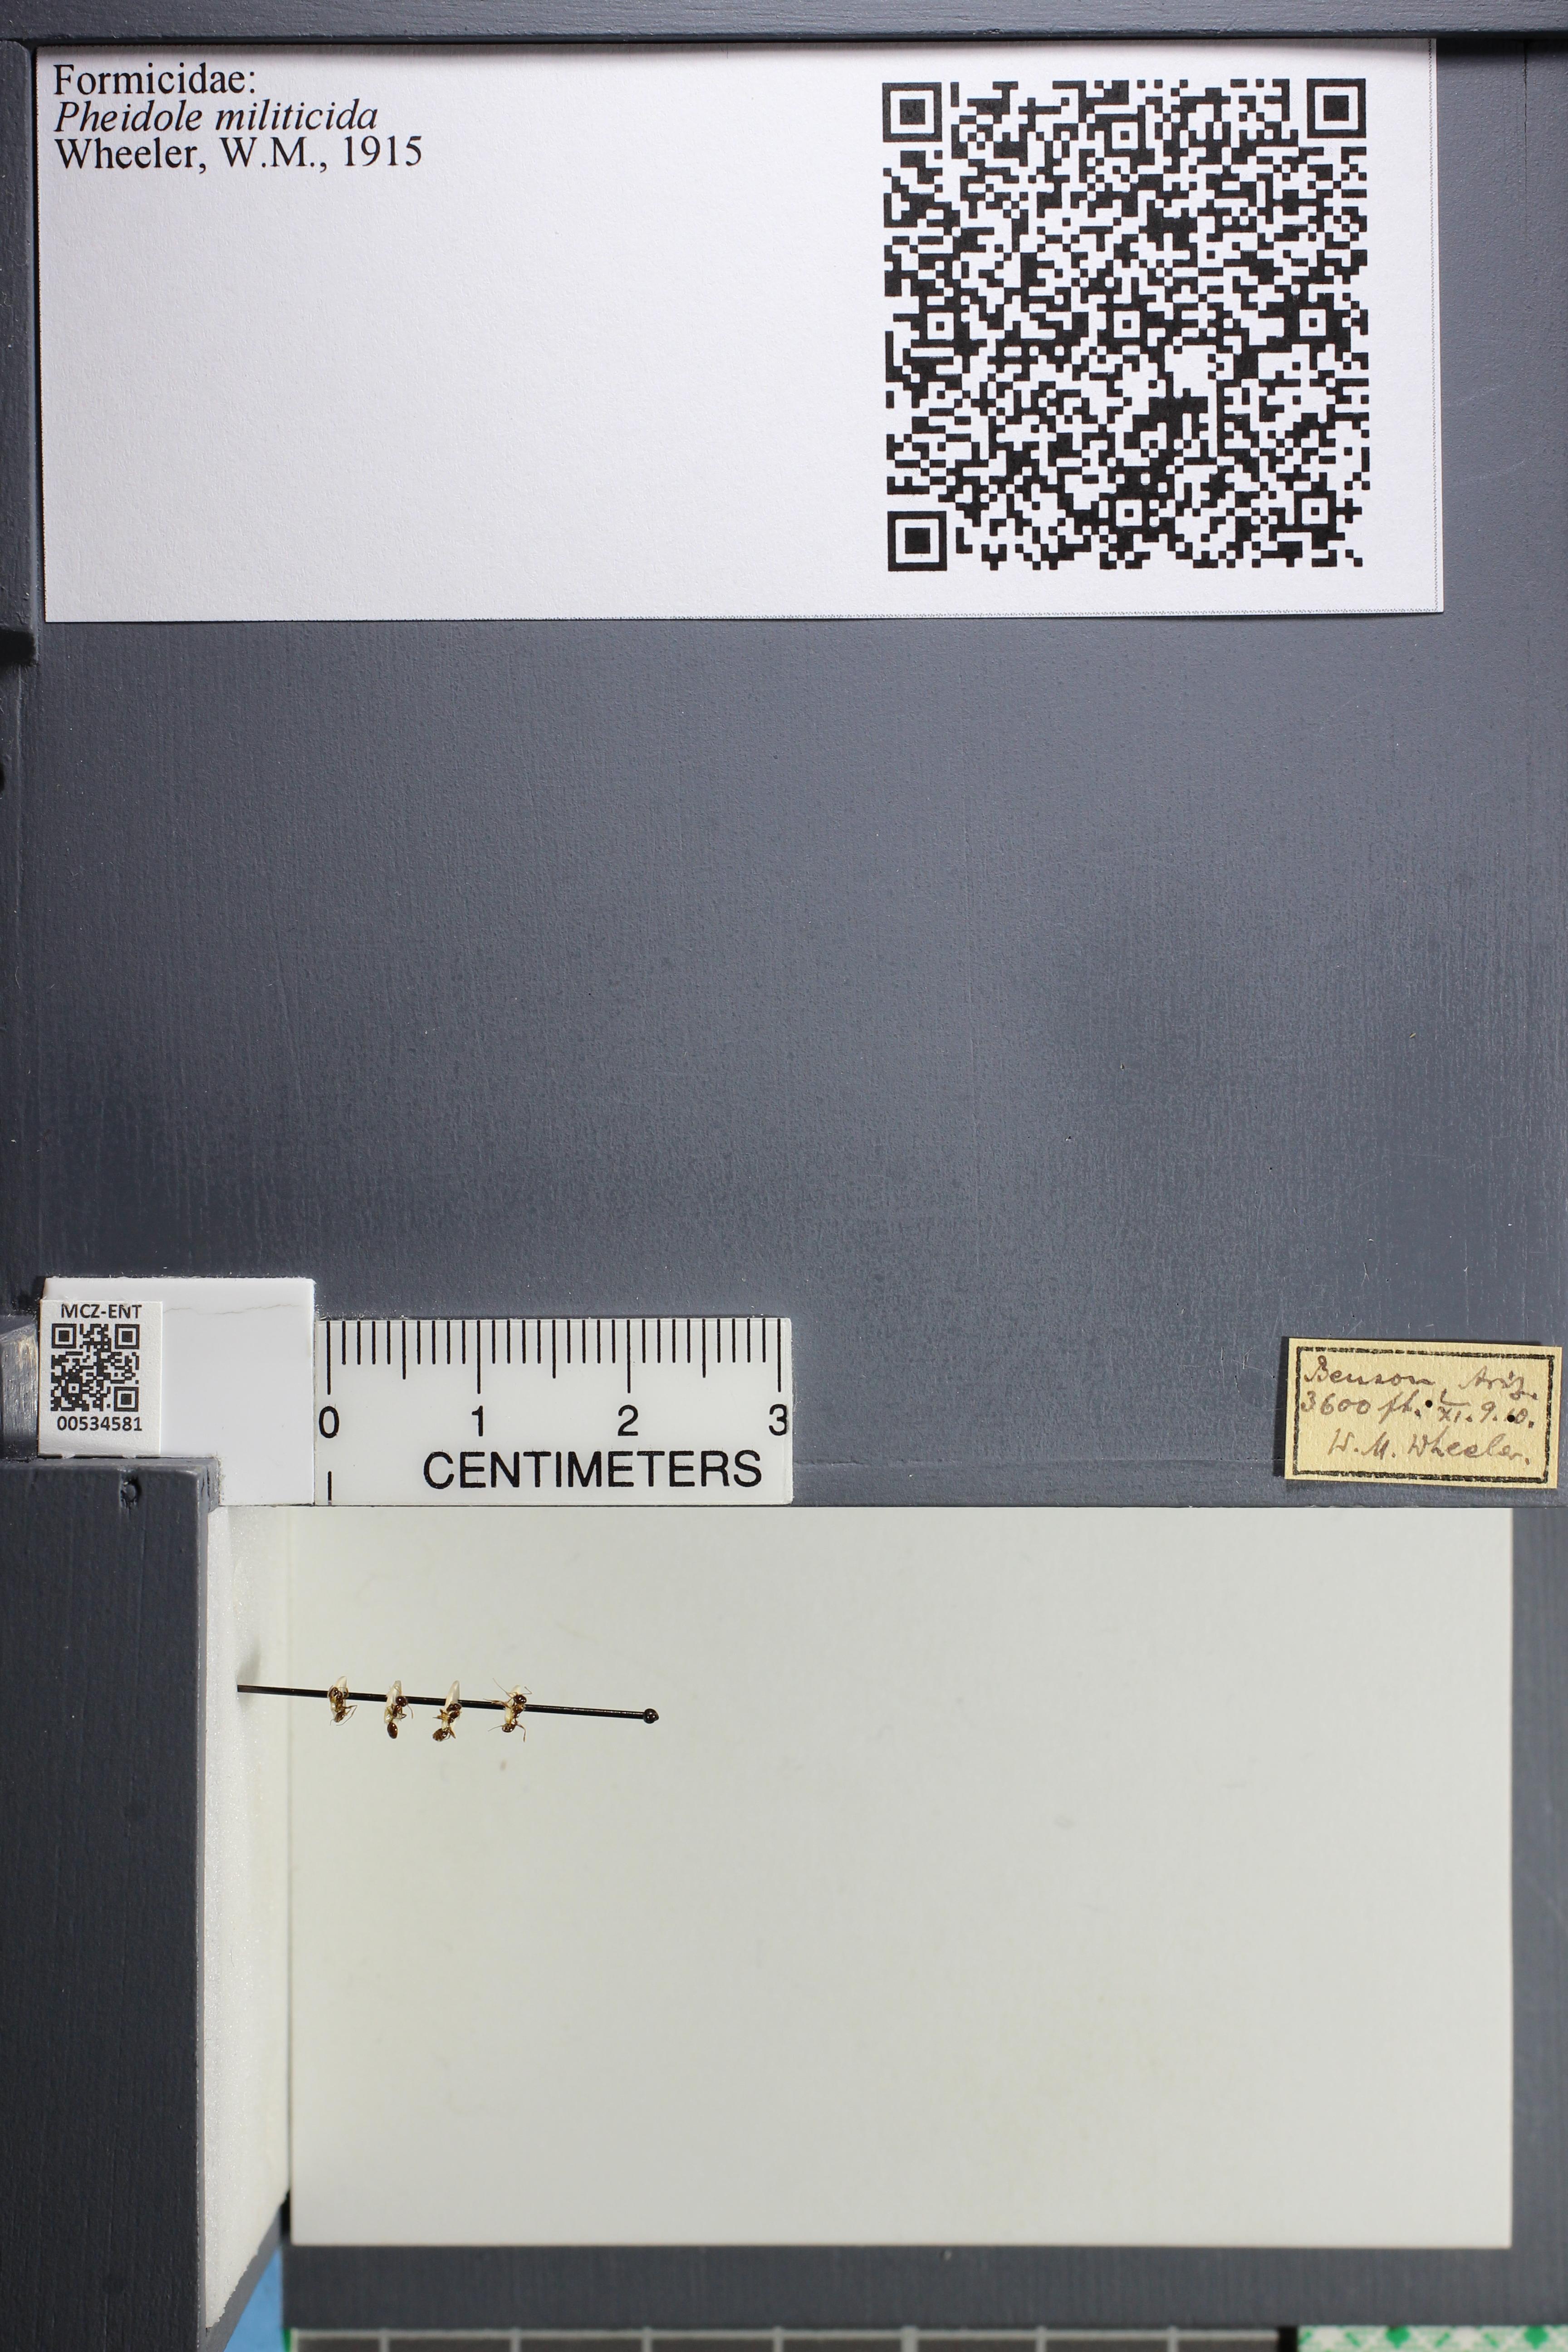 Media of type image, MCZ:Ent:534581 Identified as Pheidole militicida.